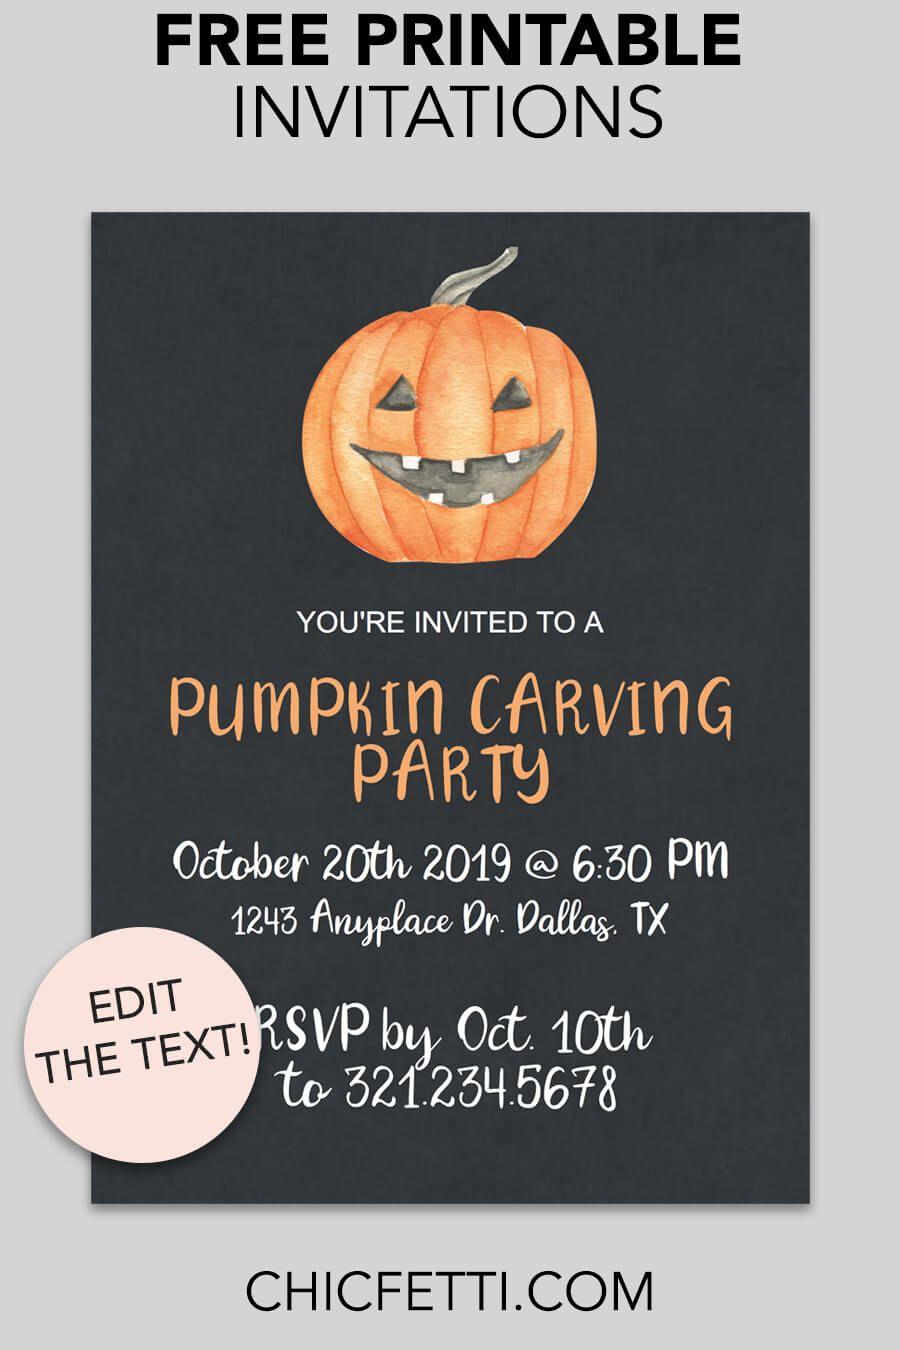 Jack O Lantern Printable Invitation Halloween Party Invitation Template Pumpkin Carving Party Free Printable Halloween Invitations